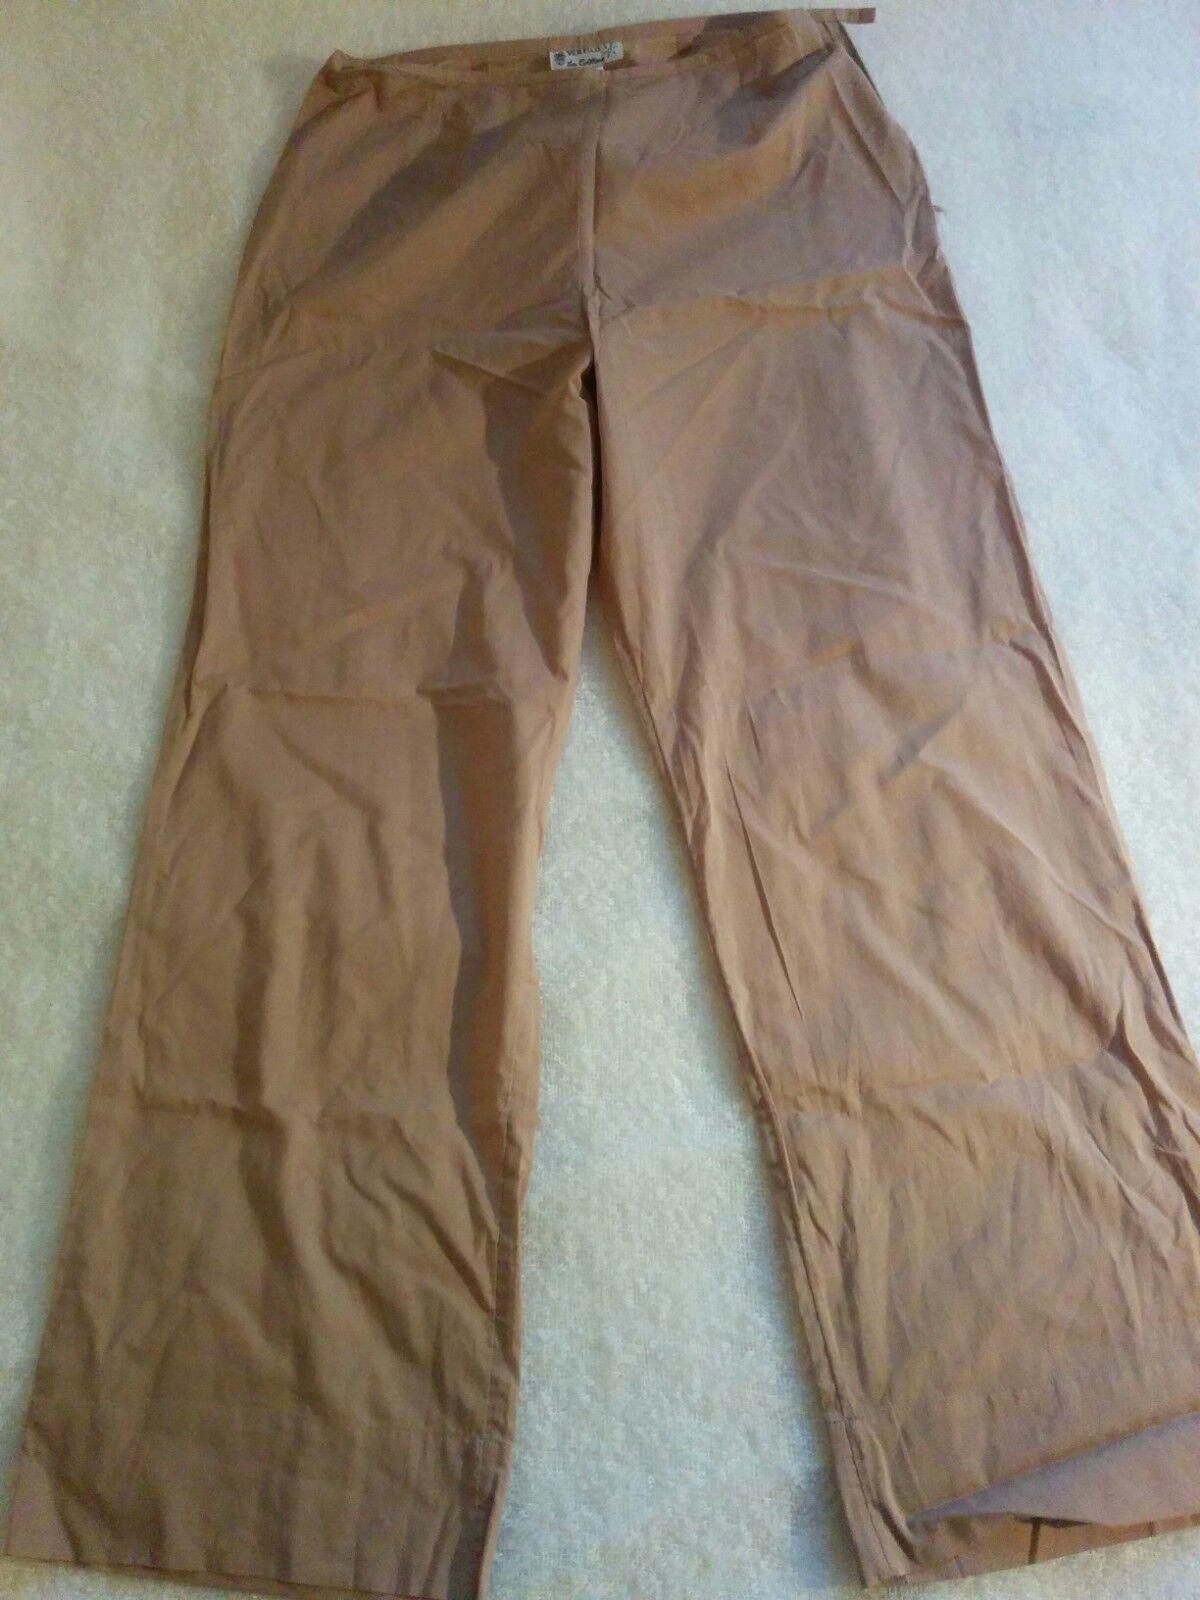 Pantalon brown clair Ventilo La Colline size 44